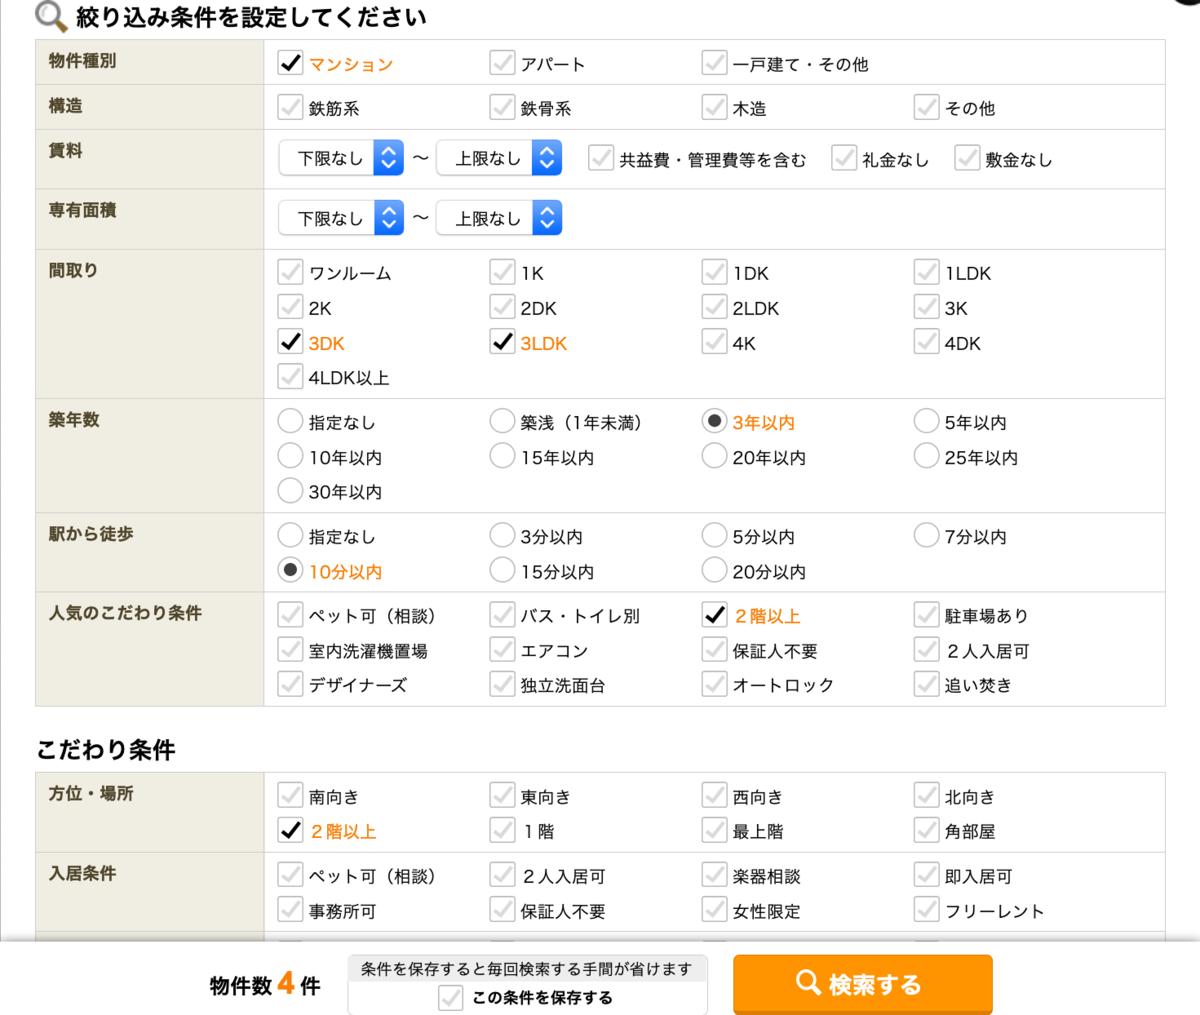 f:id:sakusaku-happy:20200214104822p:plain